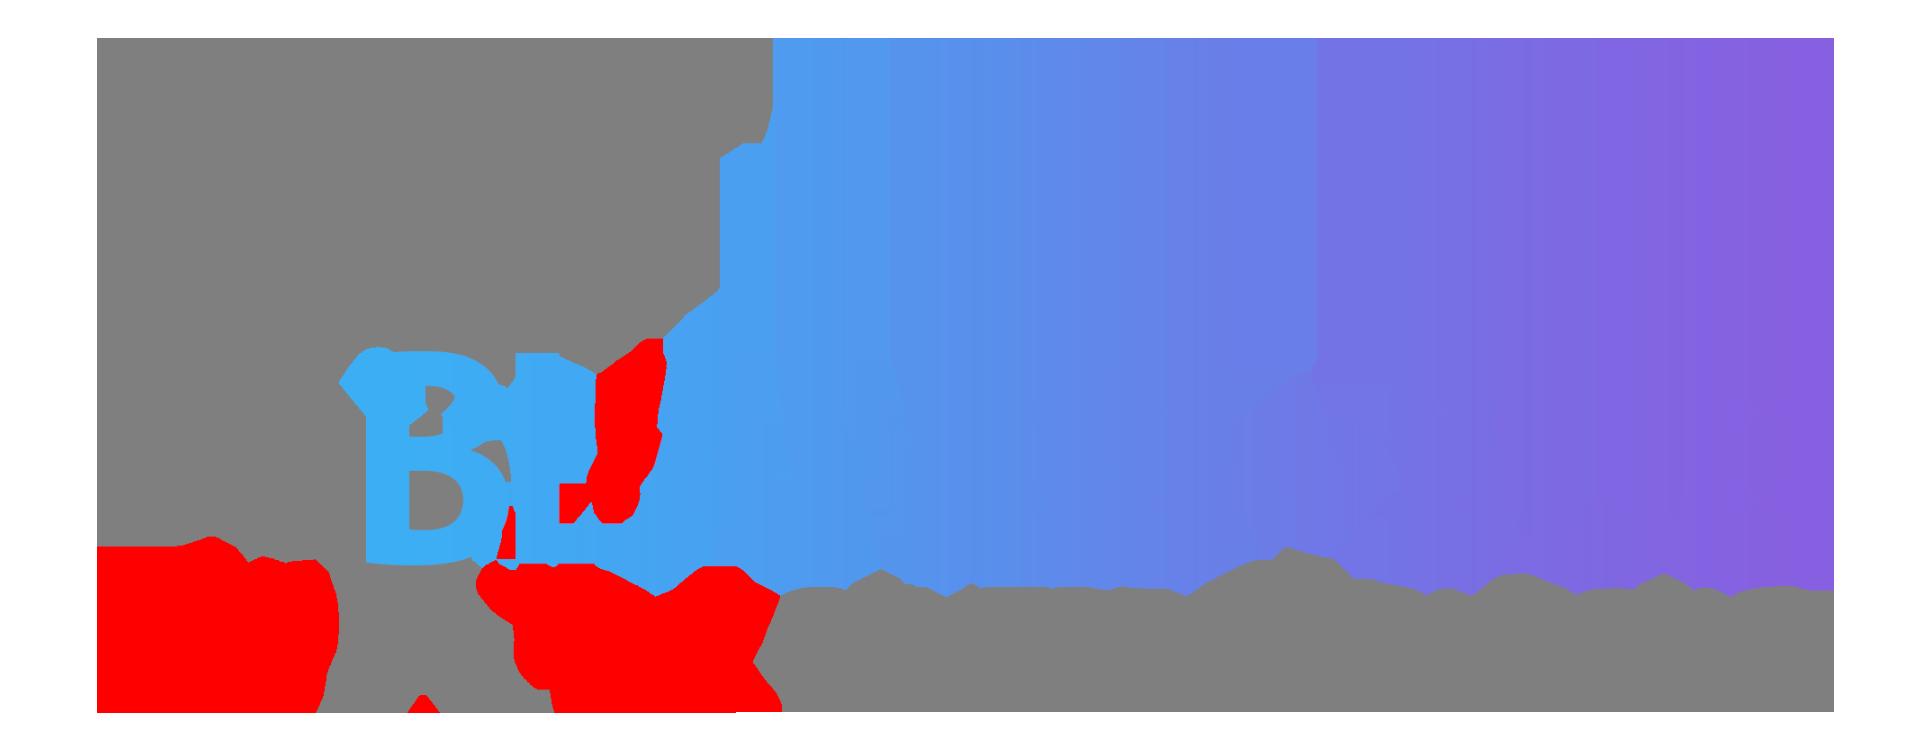 BLANES~SUB - Centre de Busseig